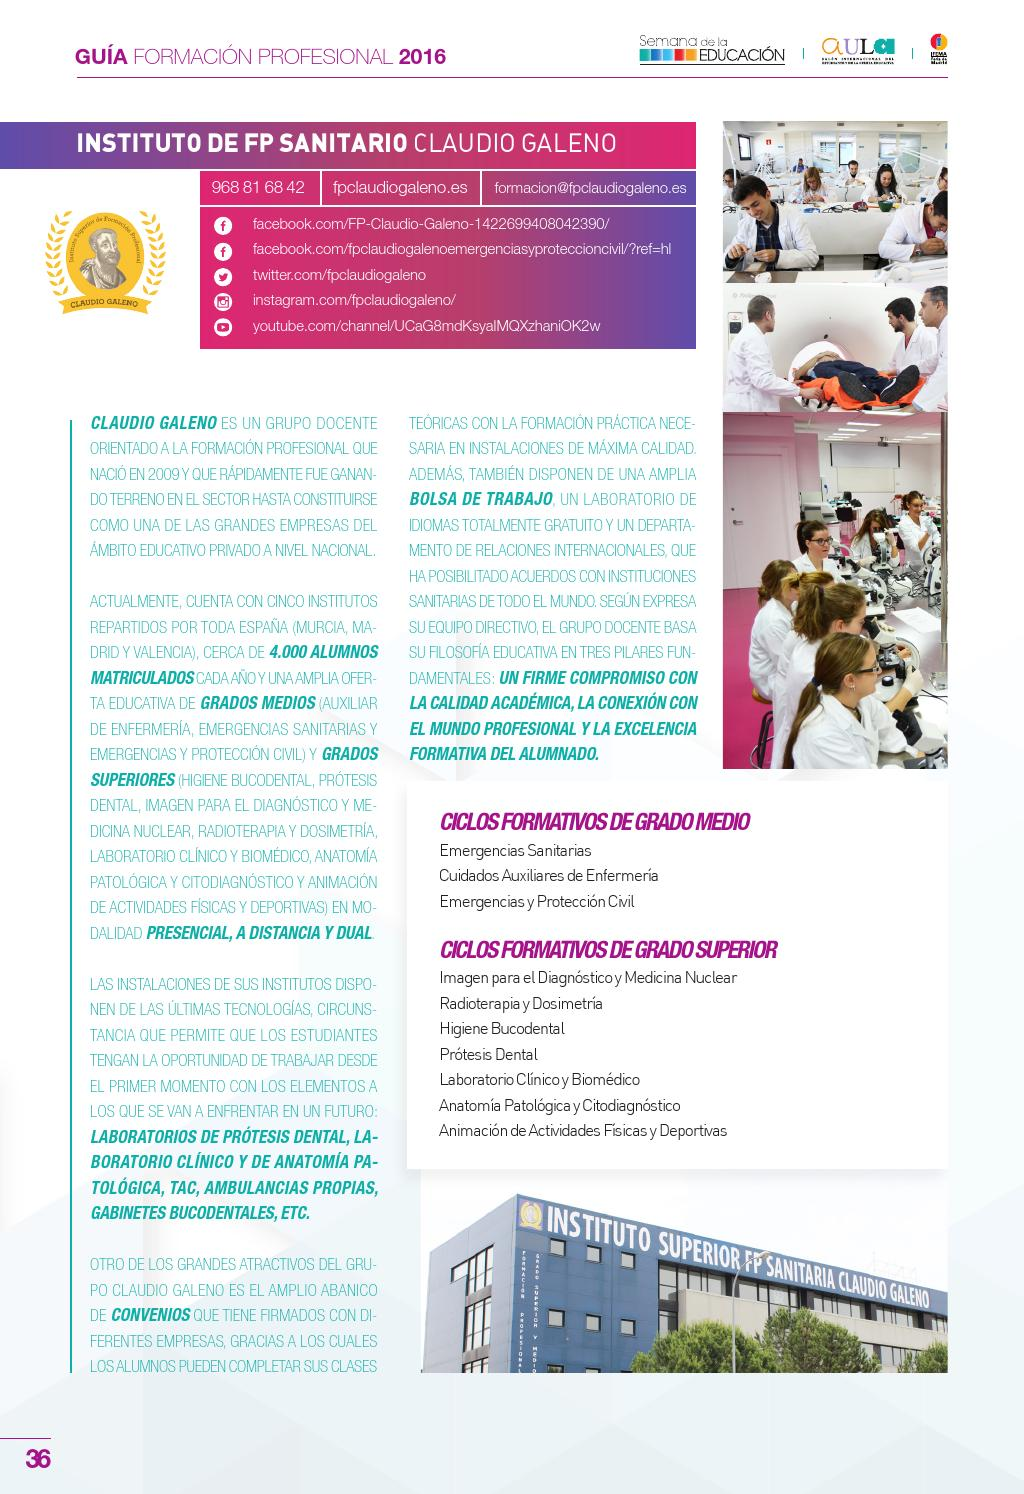 Guia Ifema Formación Profesional 2016 By Aula Magna Issuu